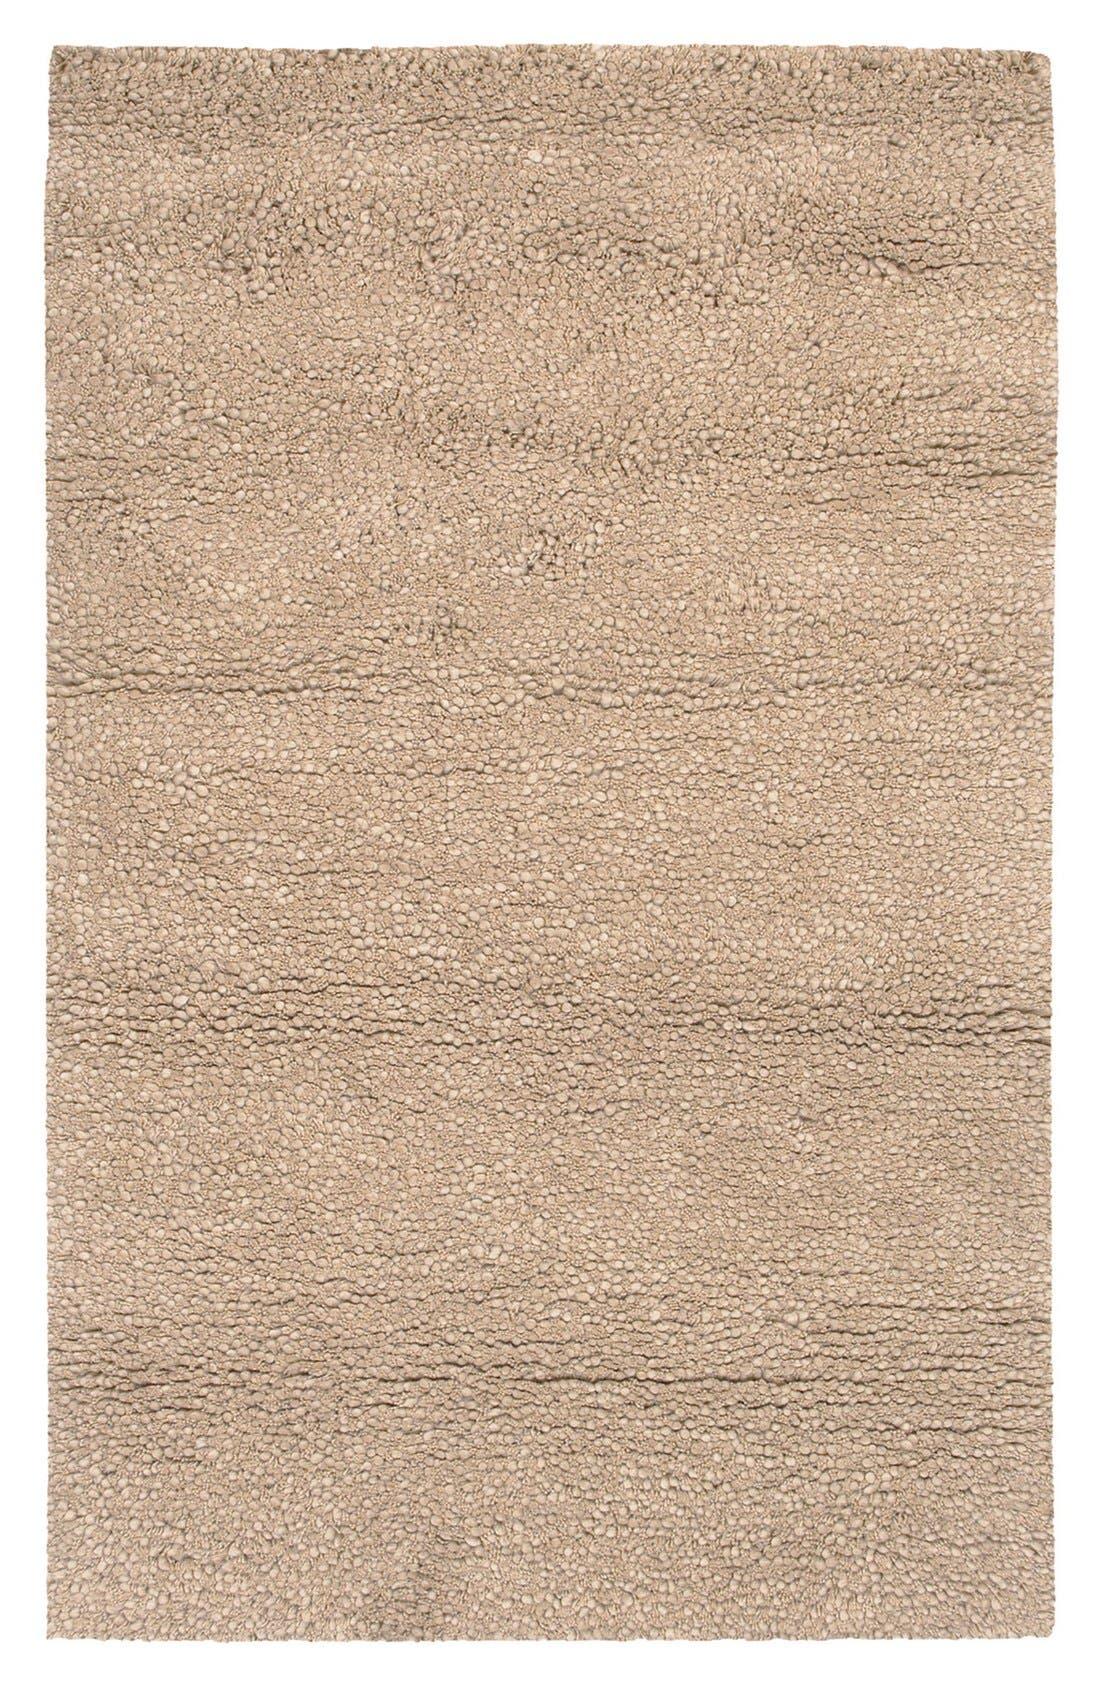 'Metropolitan' Wool Rug,                             Main thumbnail 1, color,                             Beige